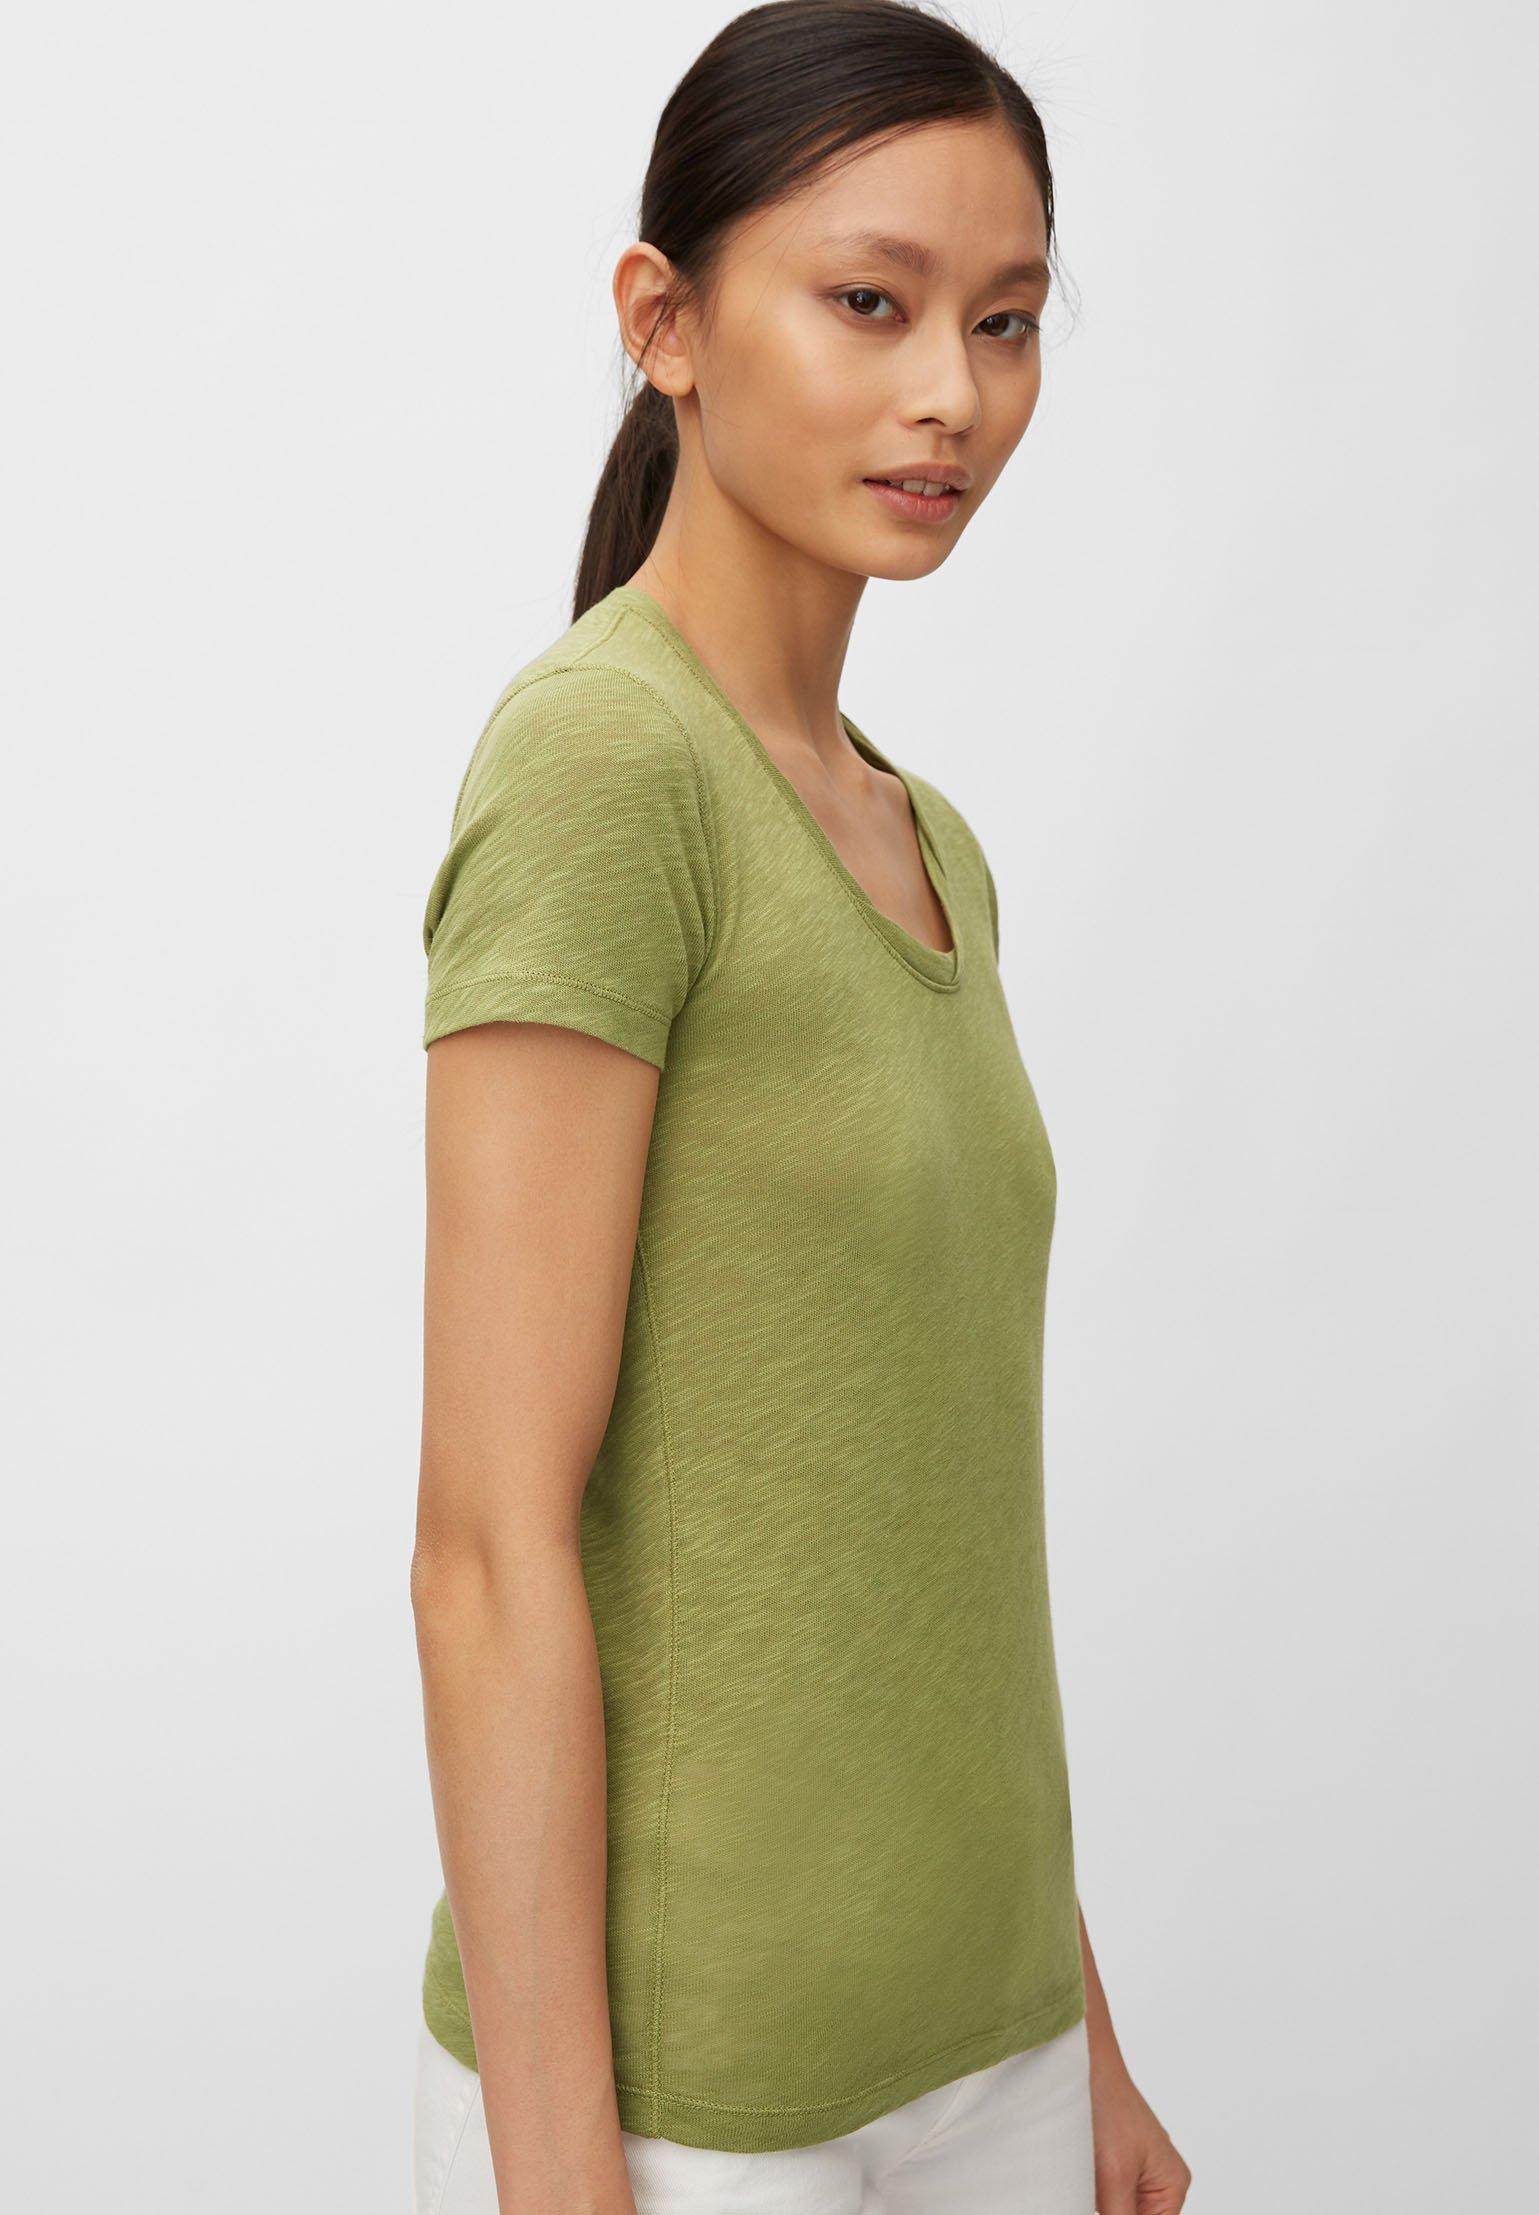 Marc O'polo T-shirt Aus Organic Cotton-jersey - Basic Seaweed Green 0YMoUac